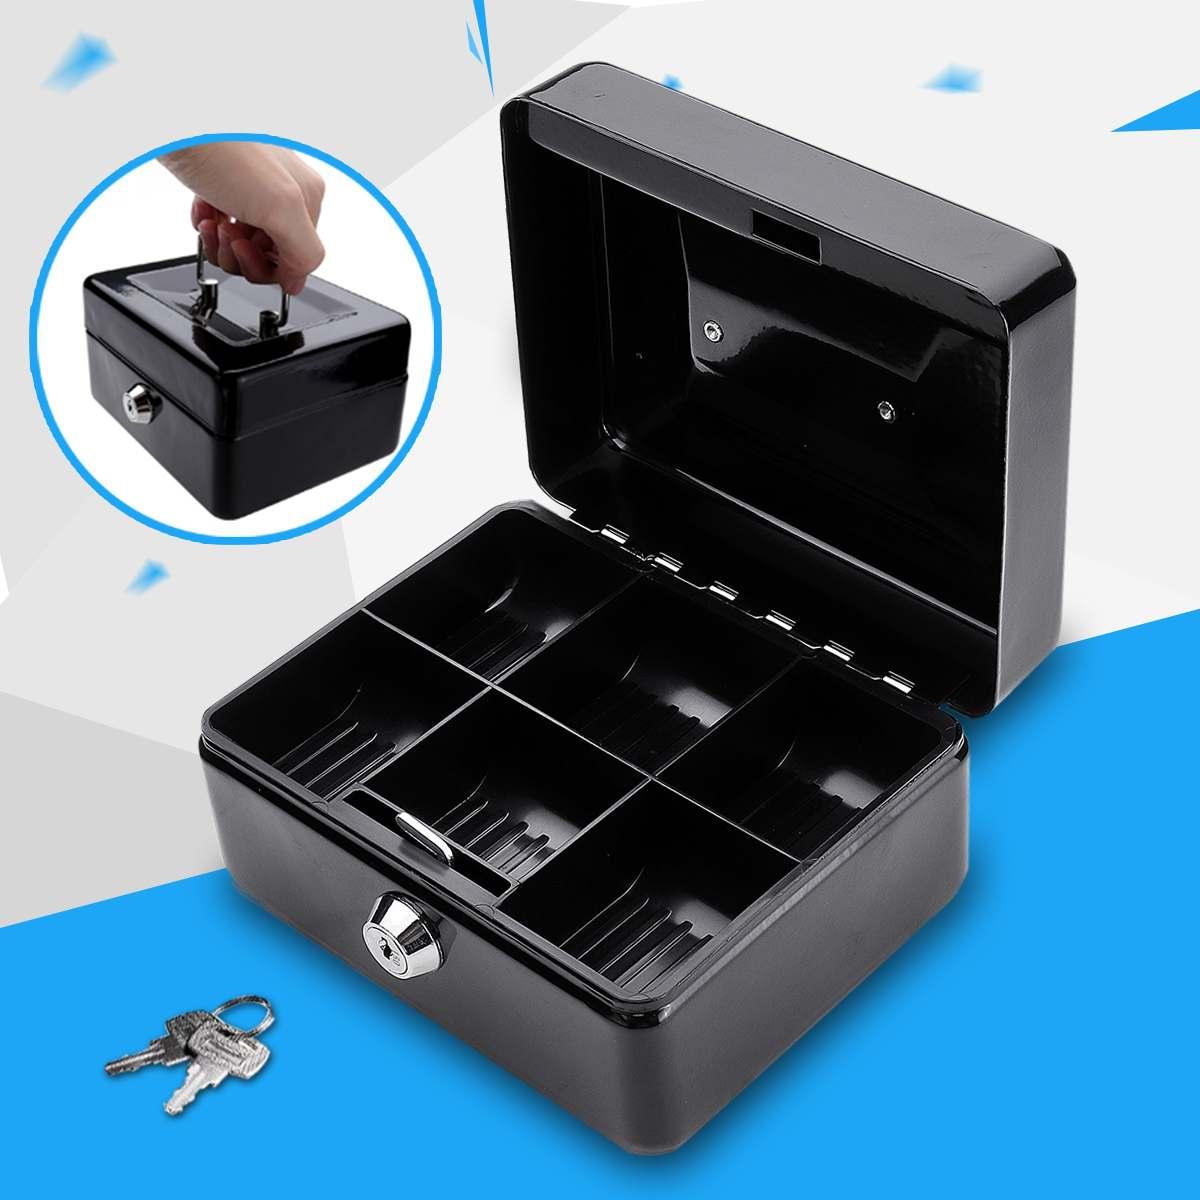 Portable Cash Box Money Organizer Key Lock Safety Storage5 Coin Trays Cover Free